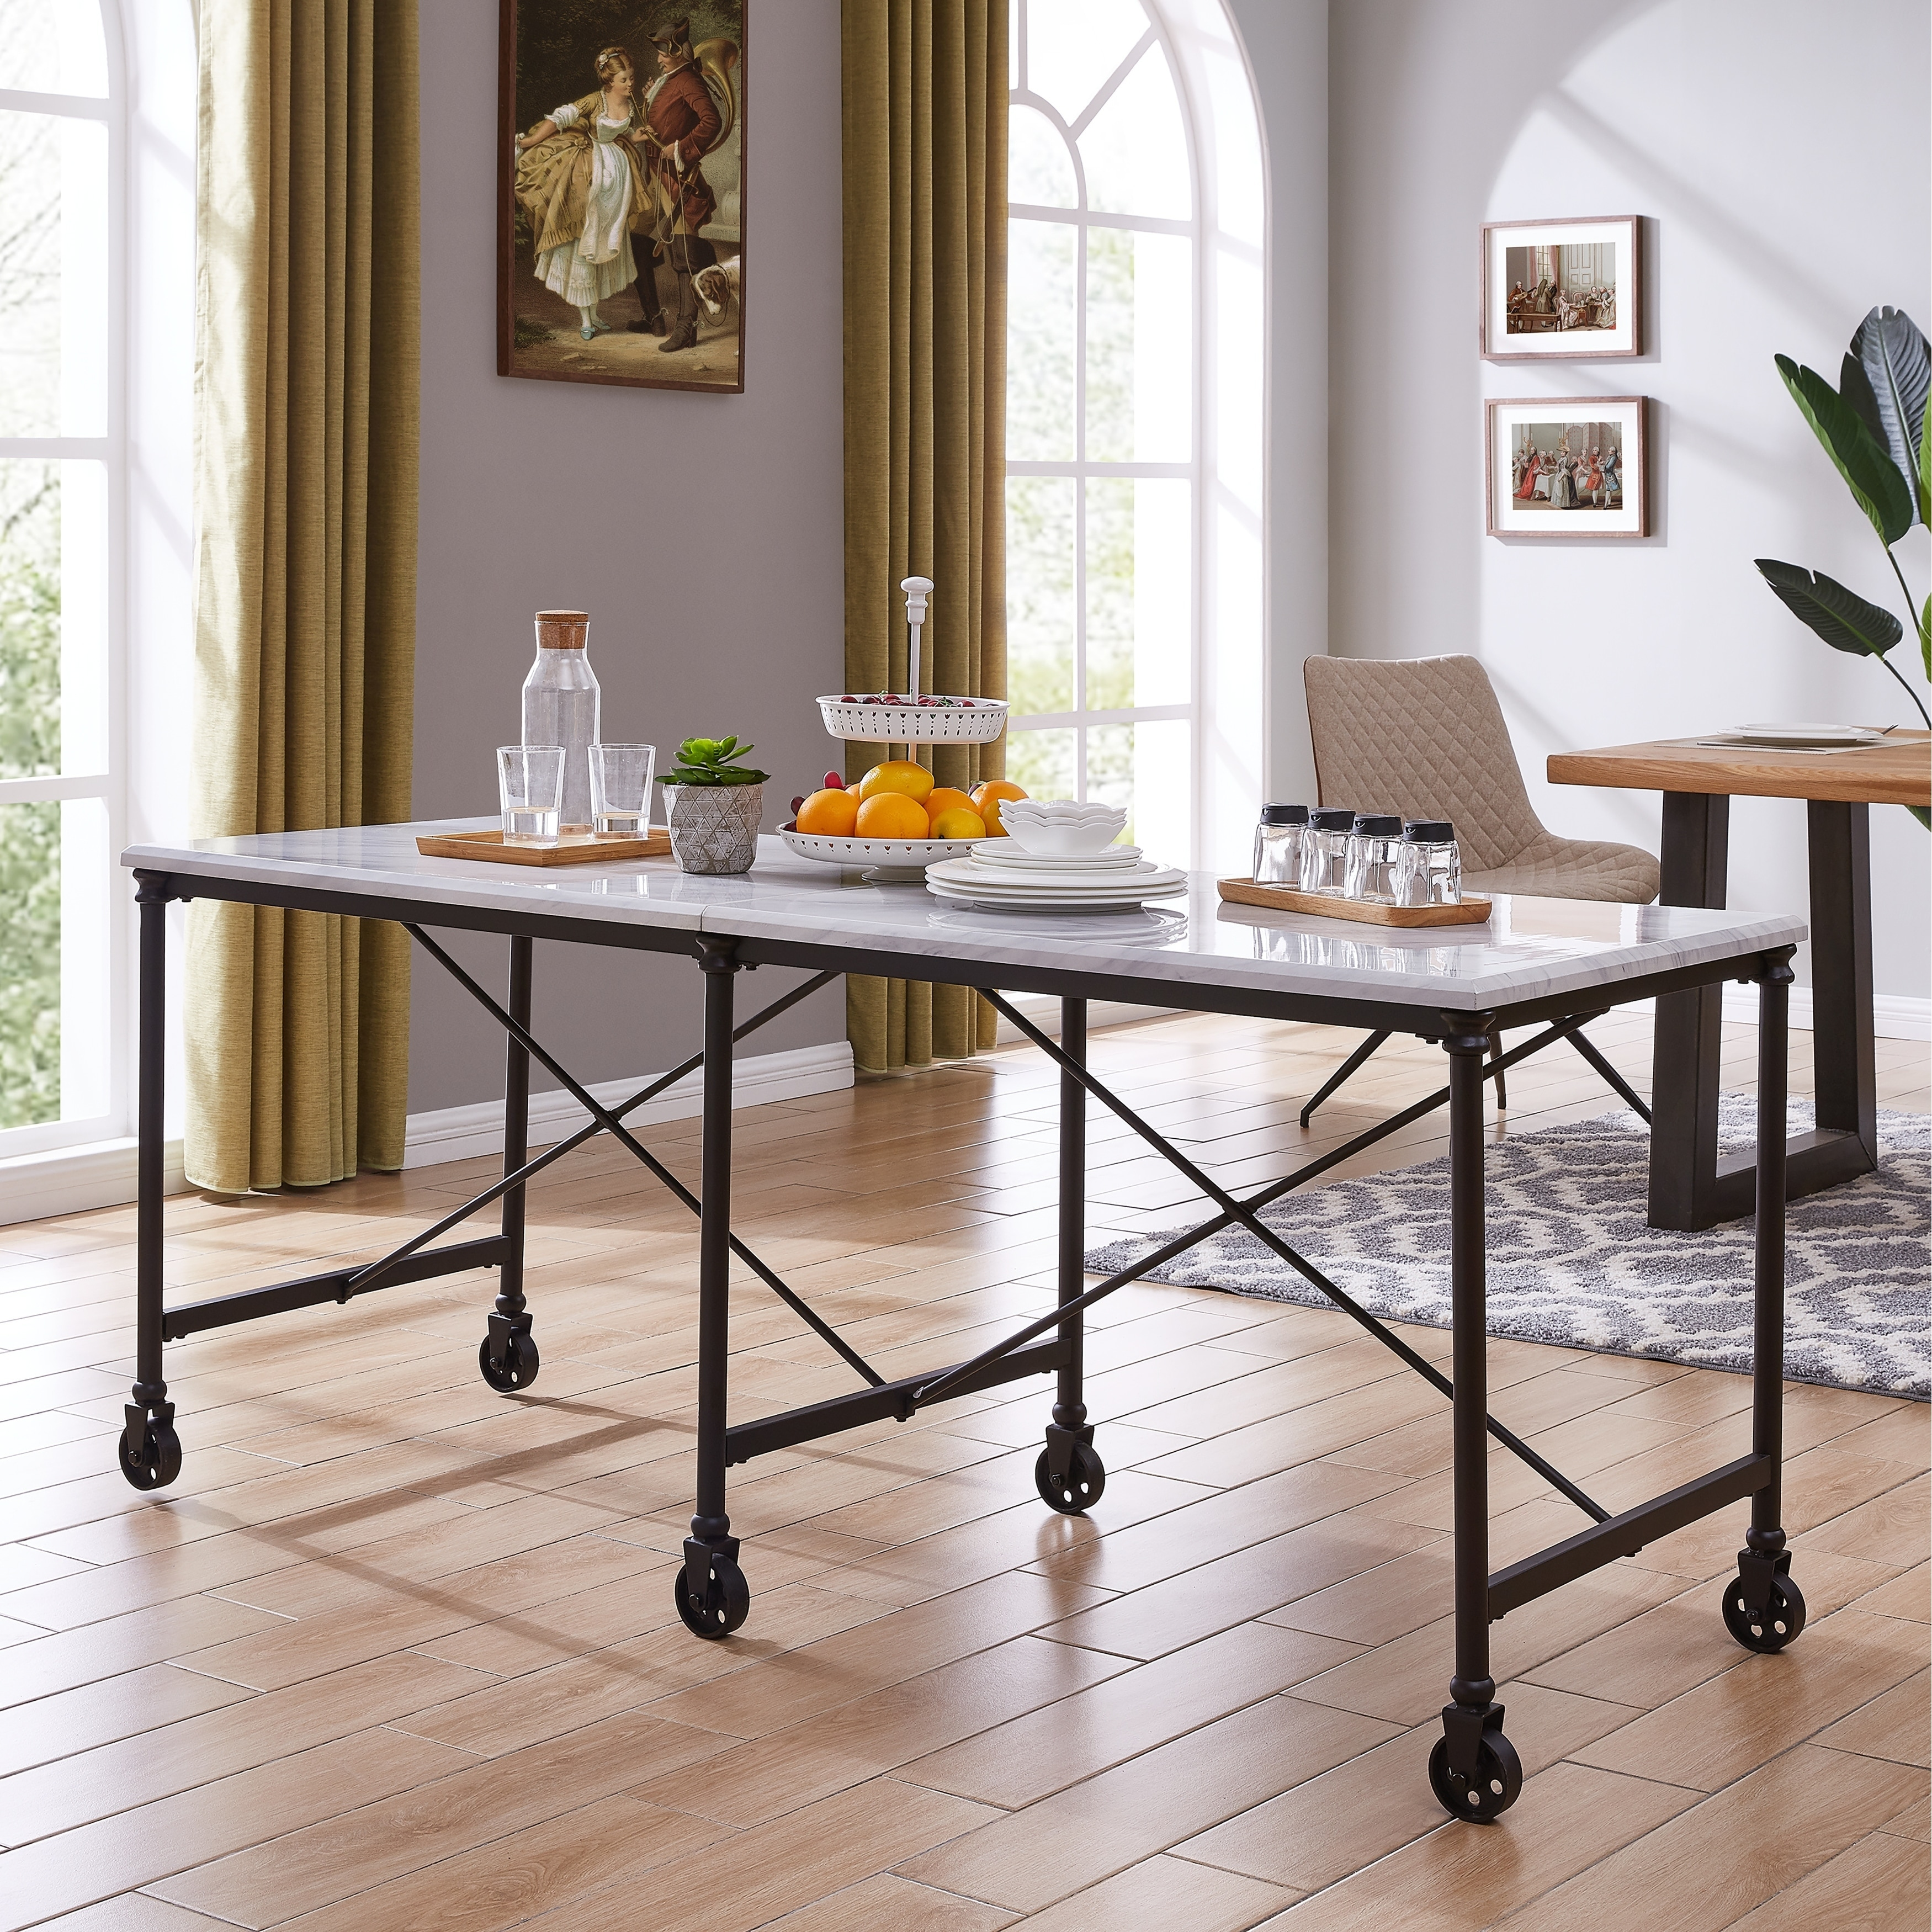 Carbon Loft Elisgner Industrial Black Metal 29 Inch Kitchen Island Table On Sale Overstock 28720413